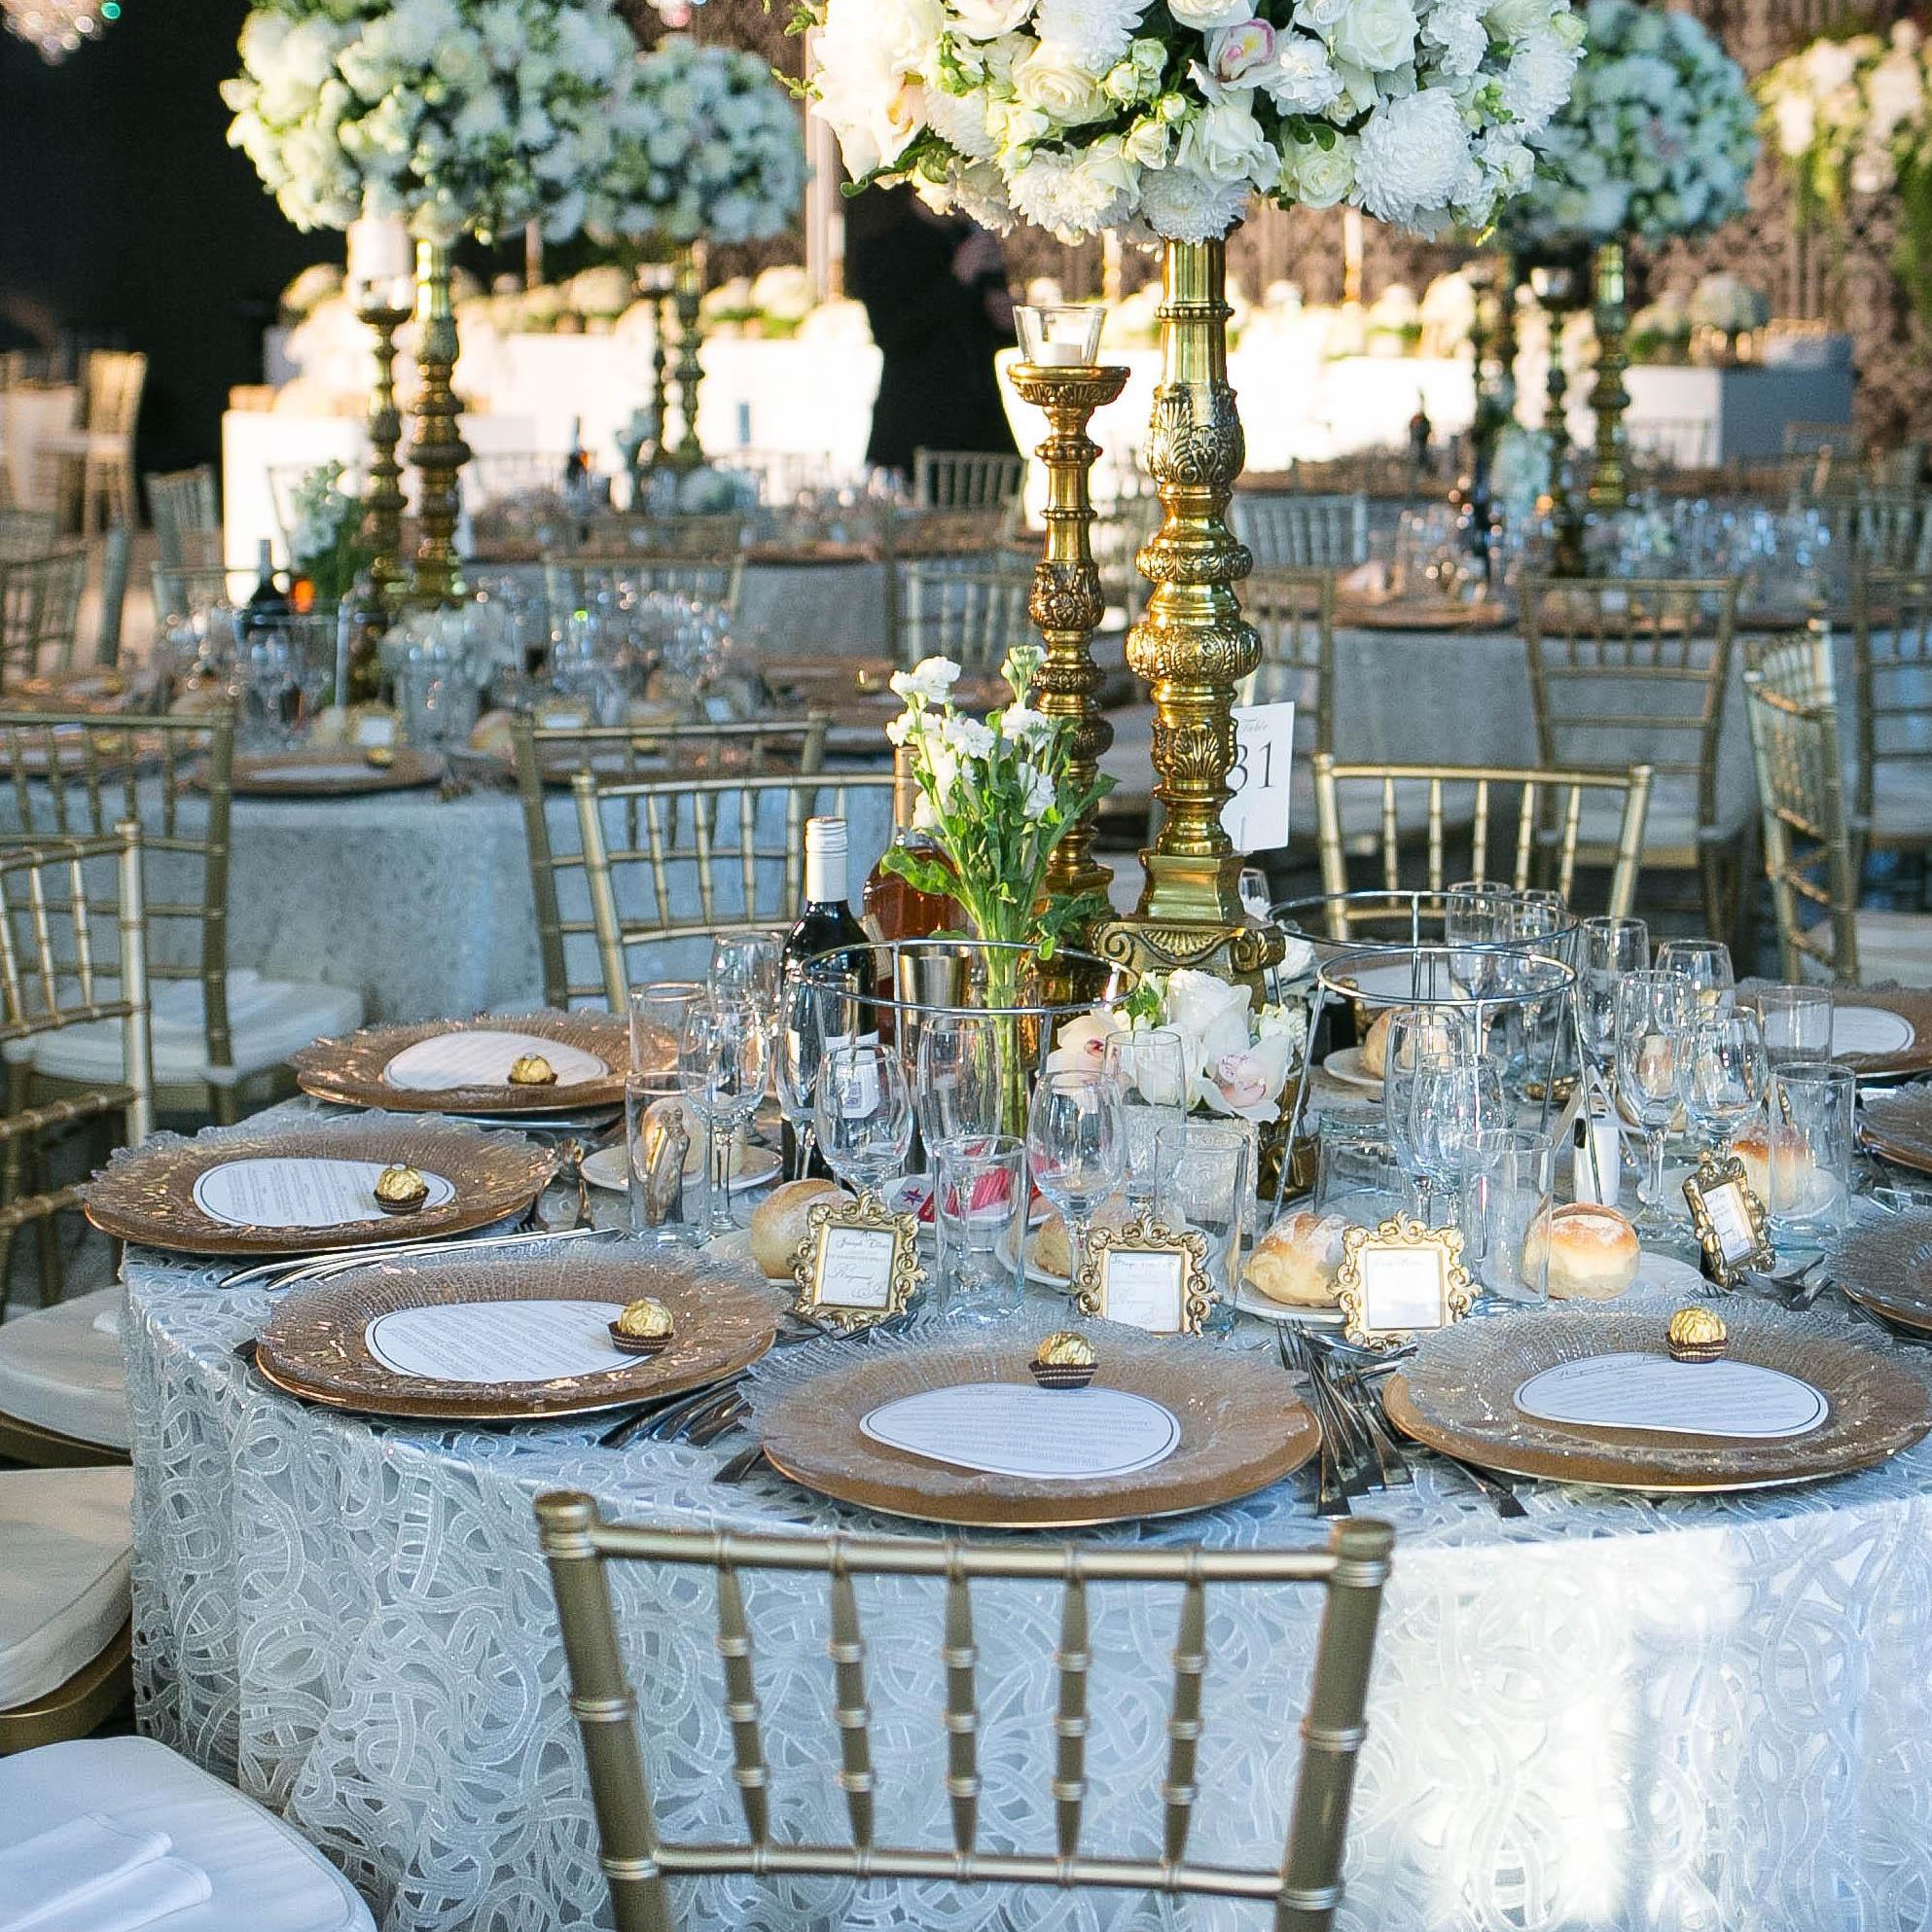 off_white_shimmer_linen_hire_weddings_events.jpg